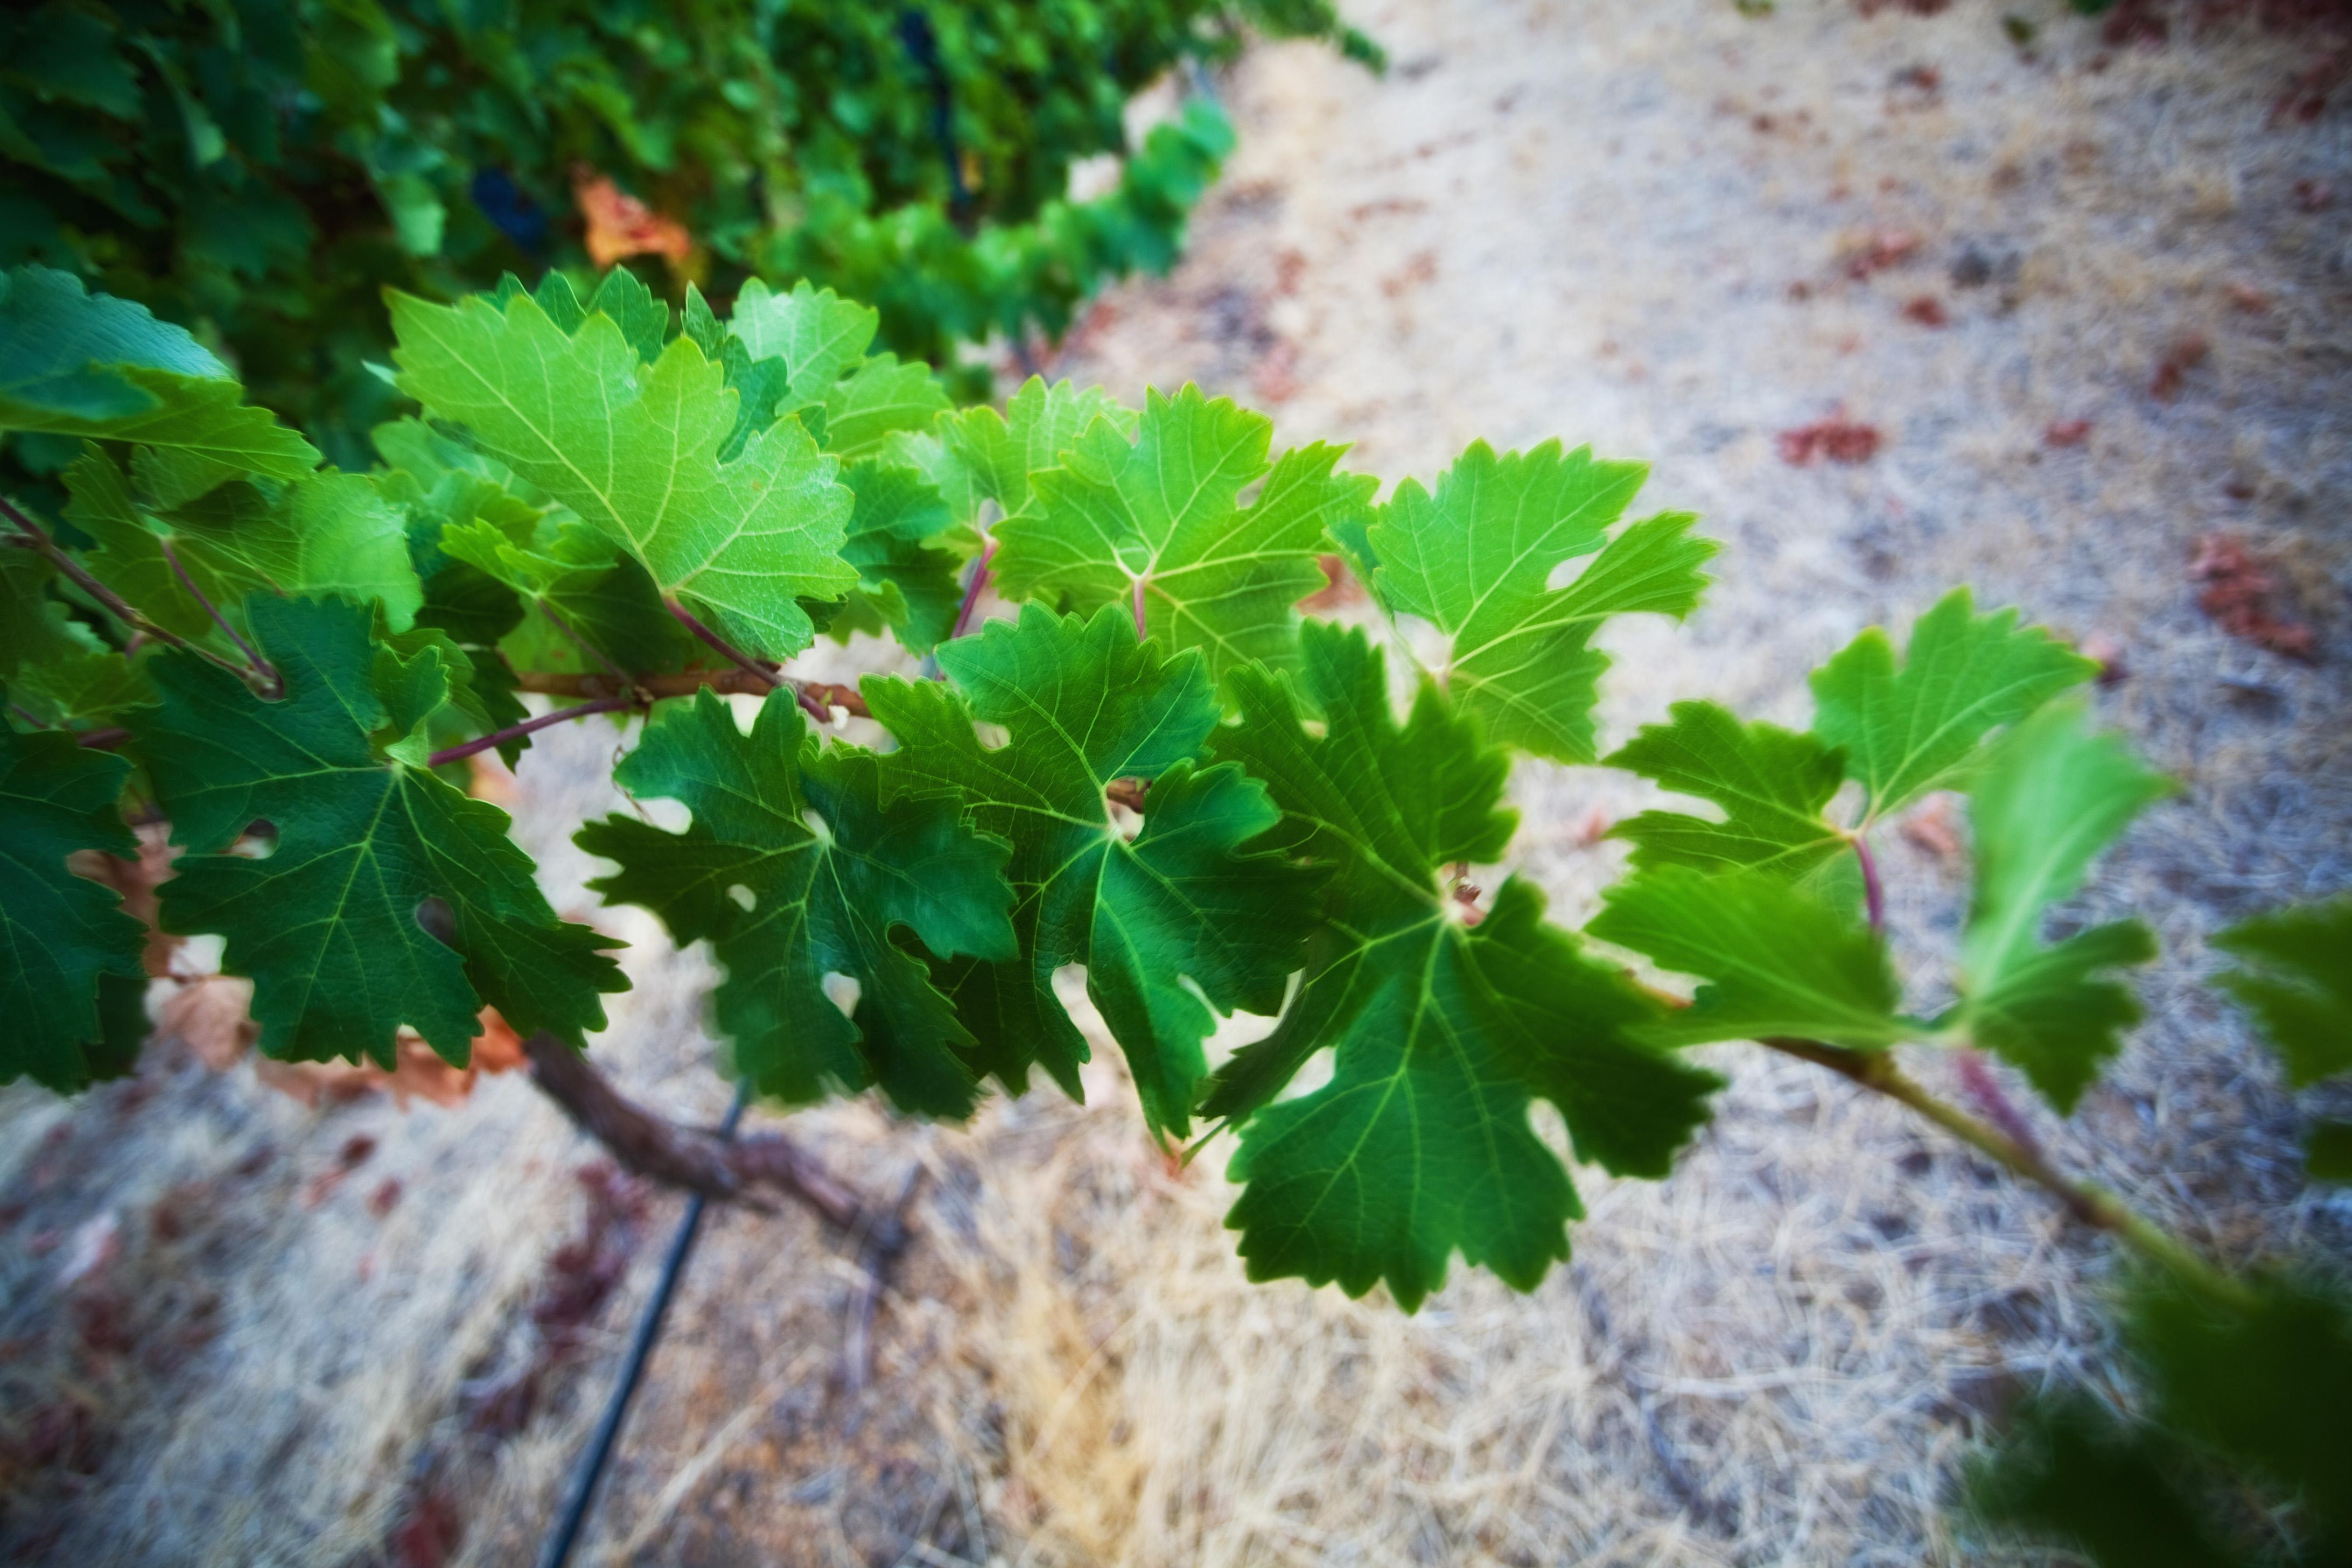 Healthy Vines